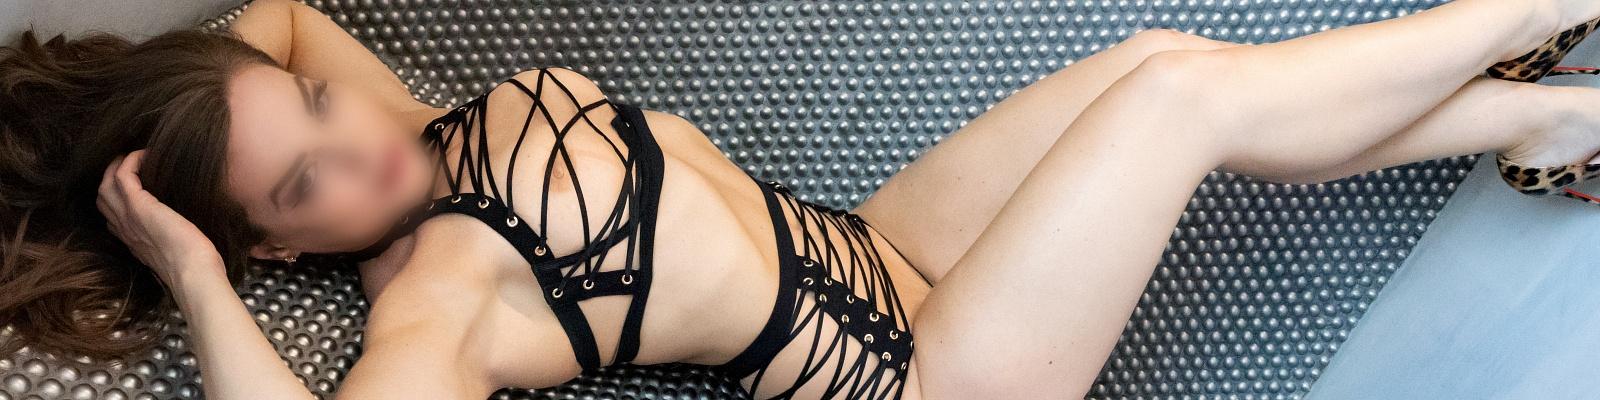 Cora Bella Certified Massage's Cover Photo